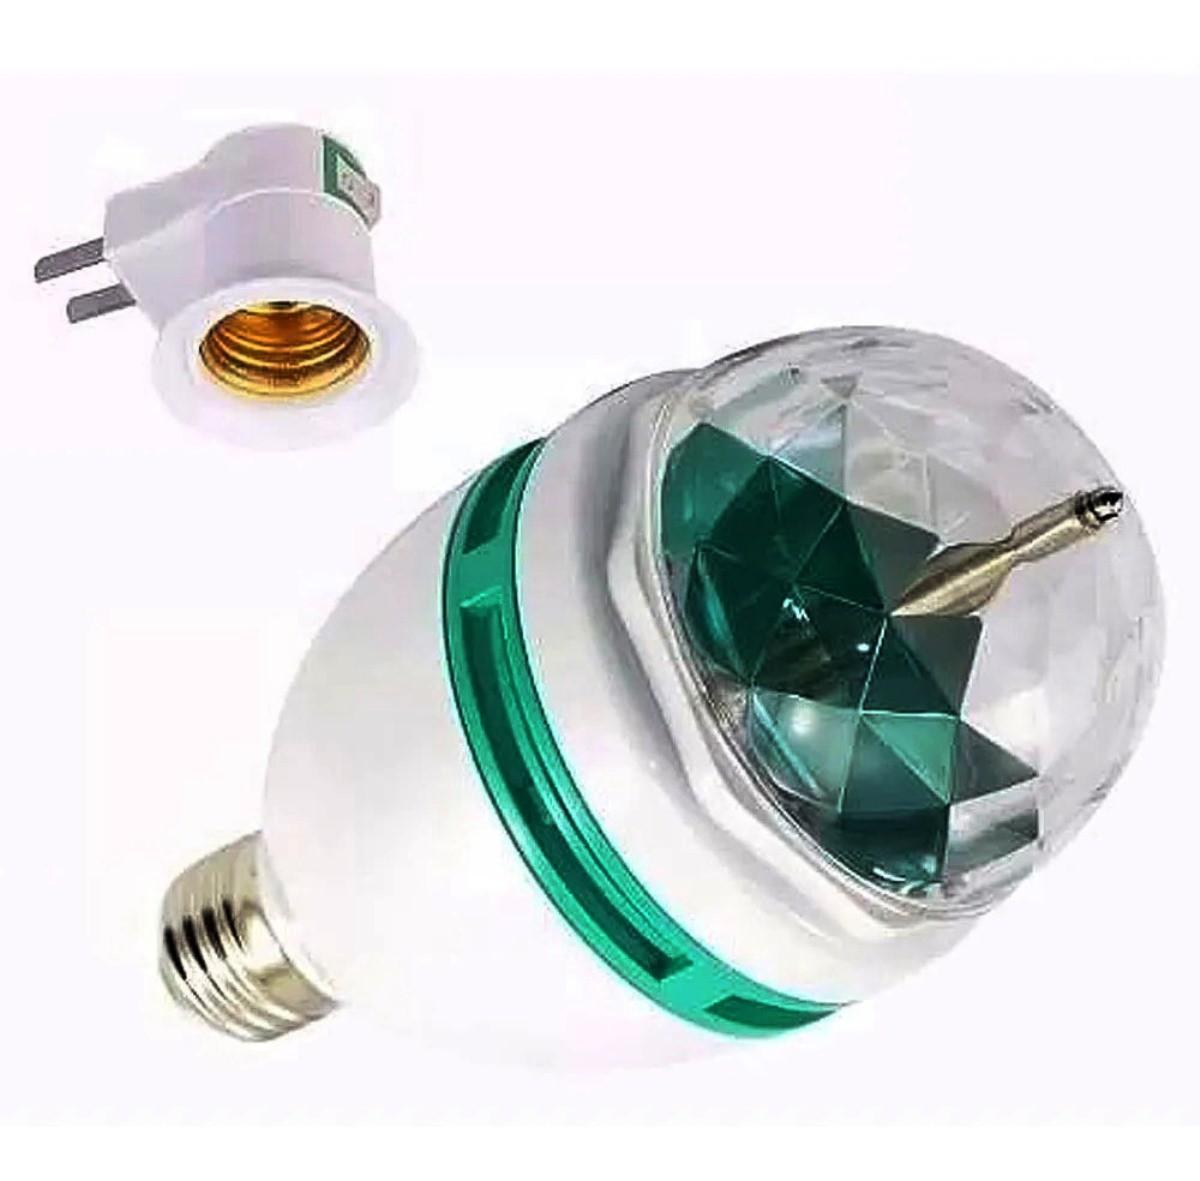 Kit 2 Lampada giratória colorida 2 Mini Projetor Holográfico